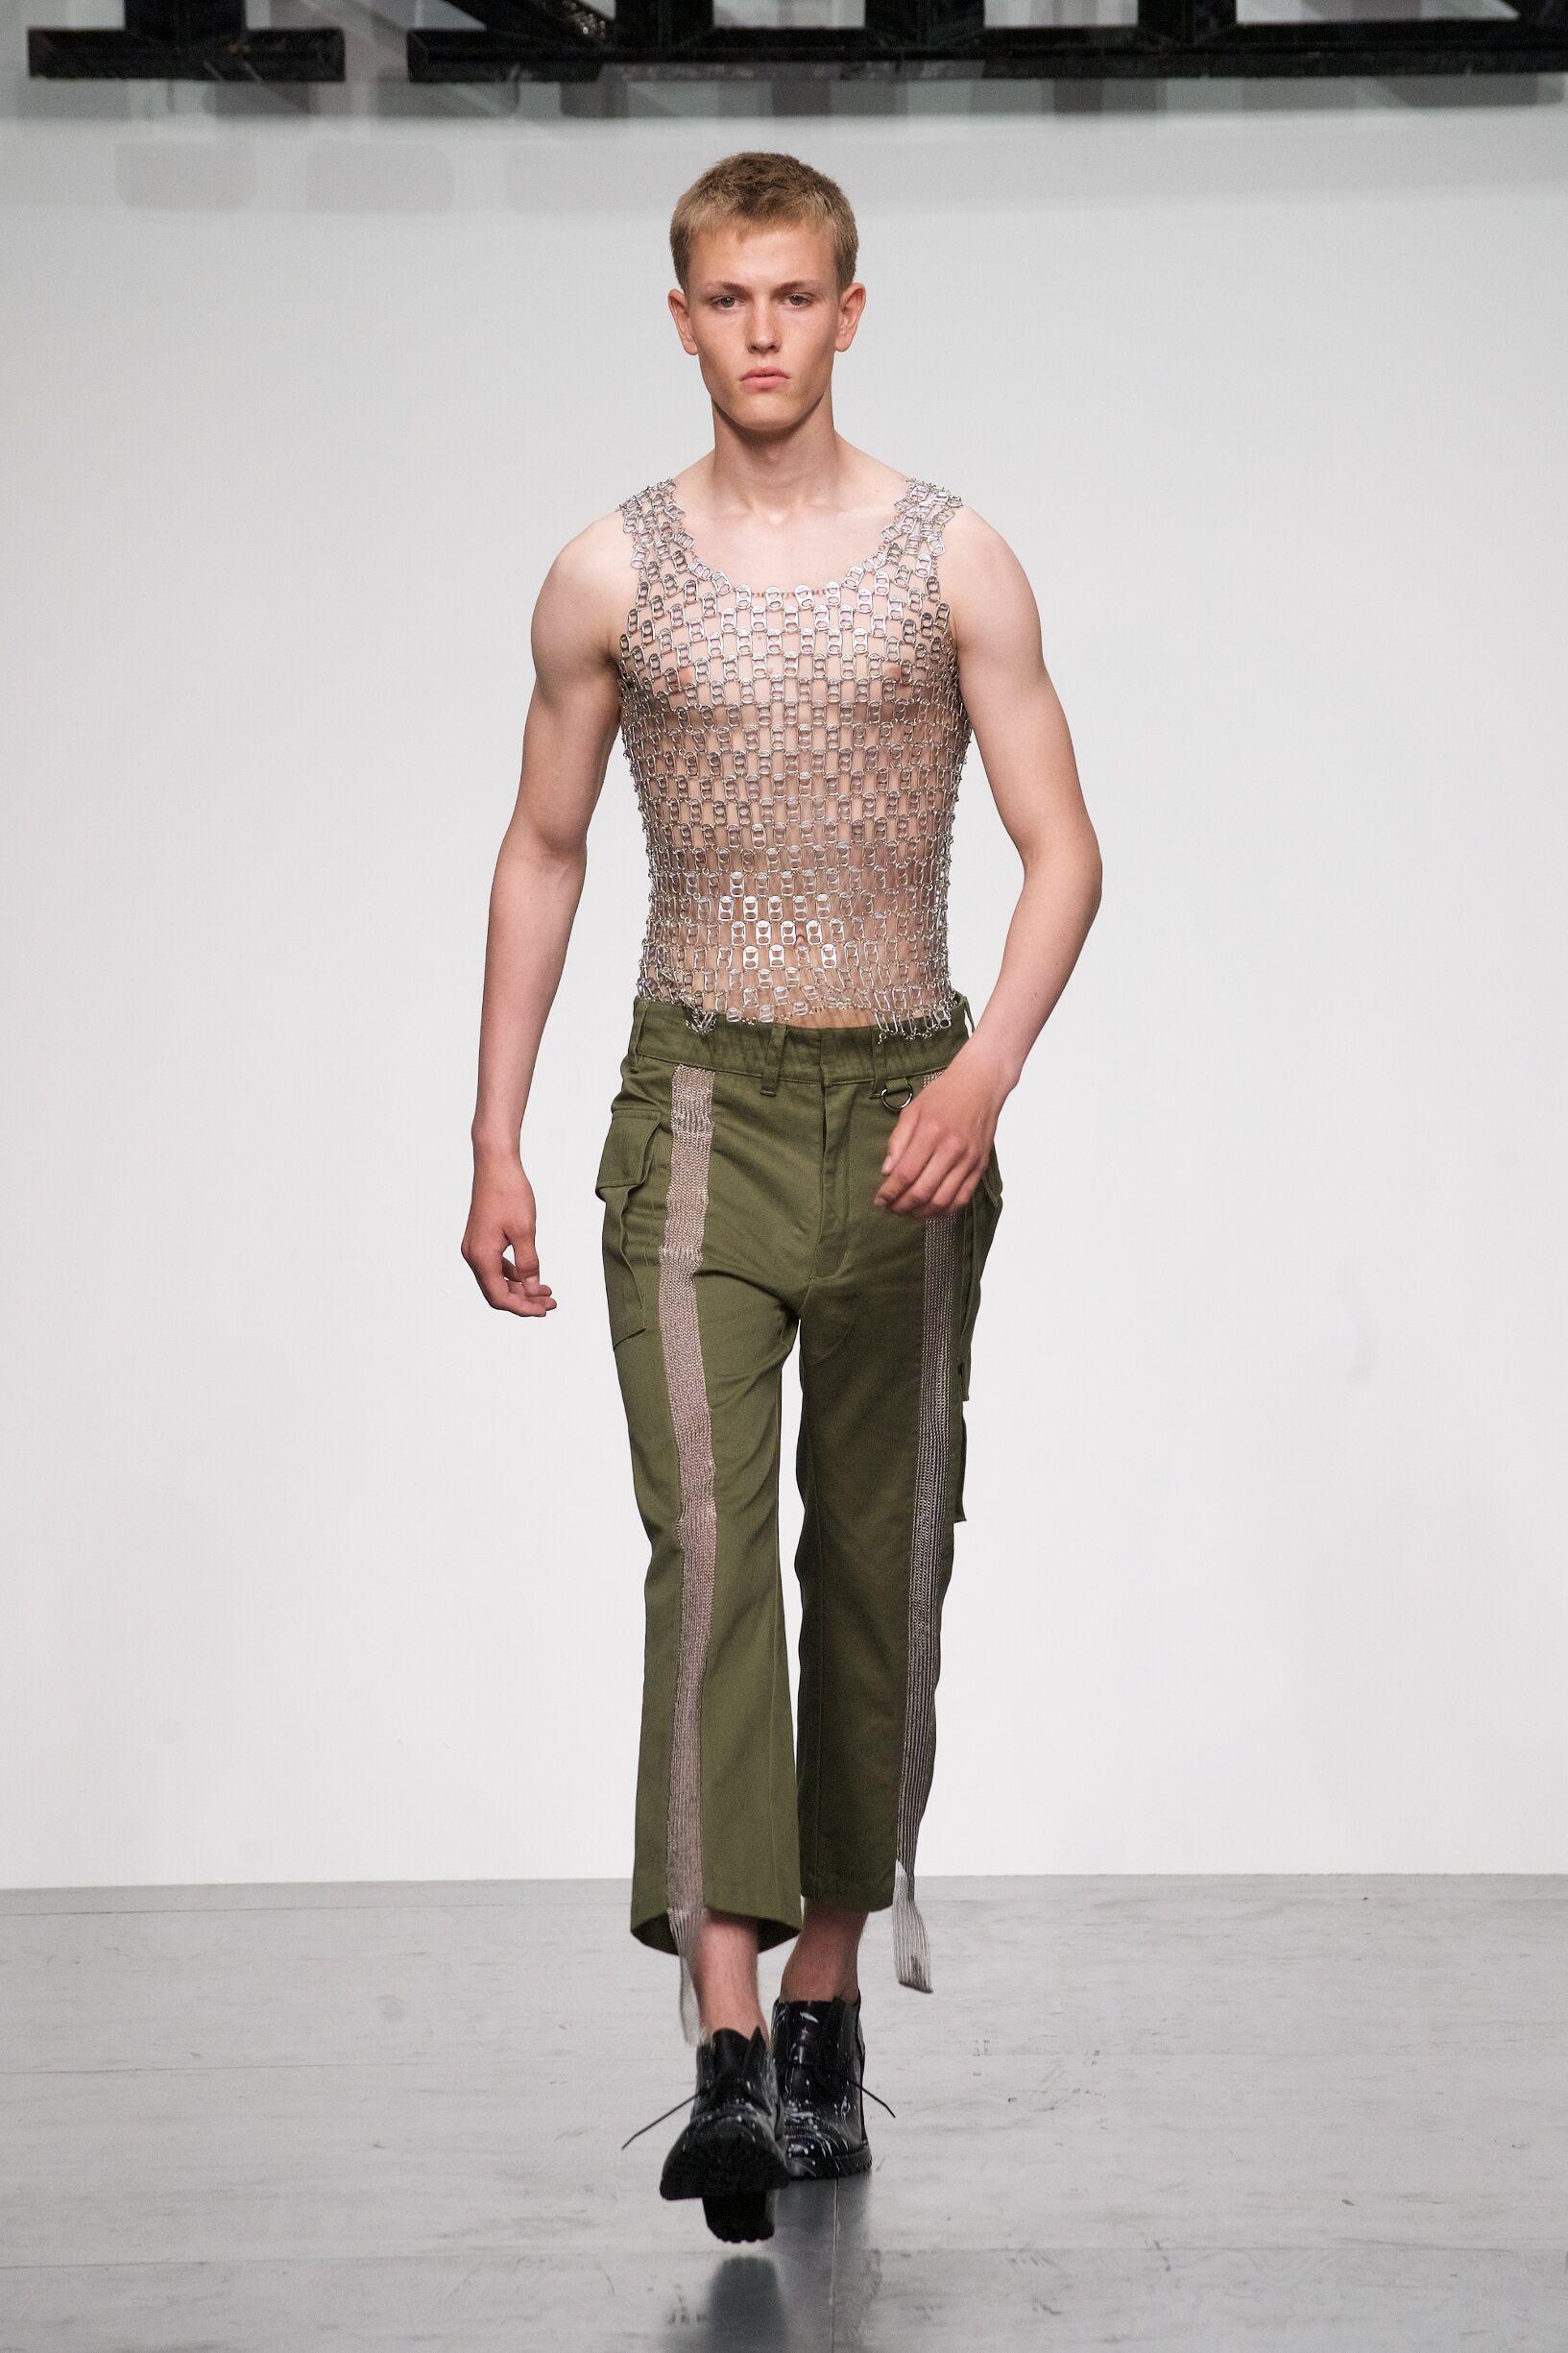 Man Model Fashion Show KTZ